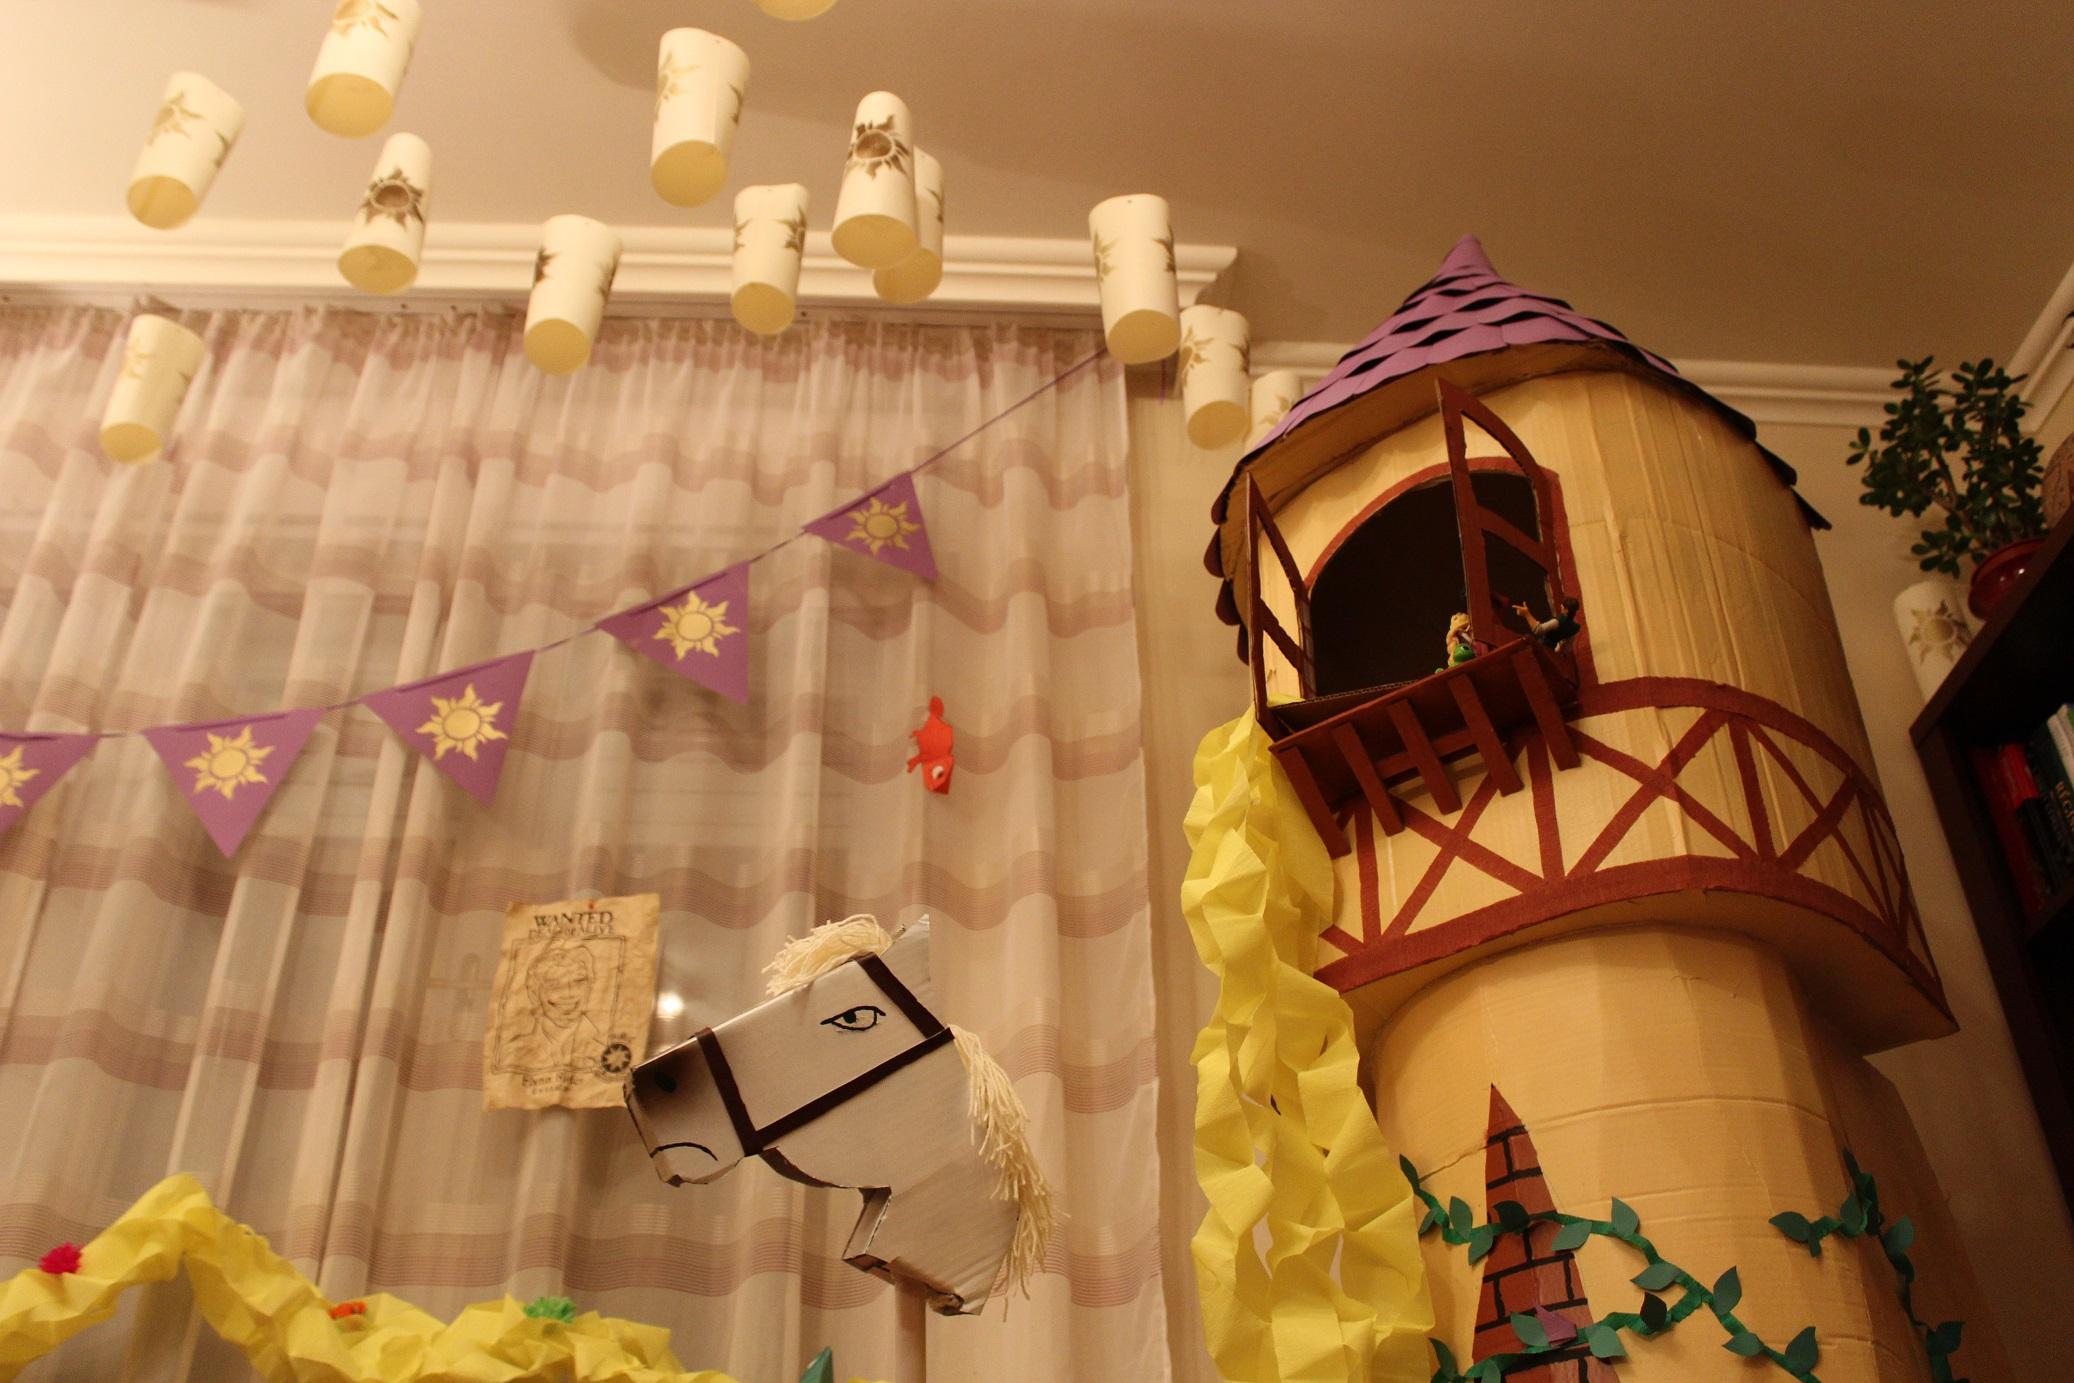 szmk_tangled_aranyhaj_birthday_party_szulinap_dekor_buli_6.JPG